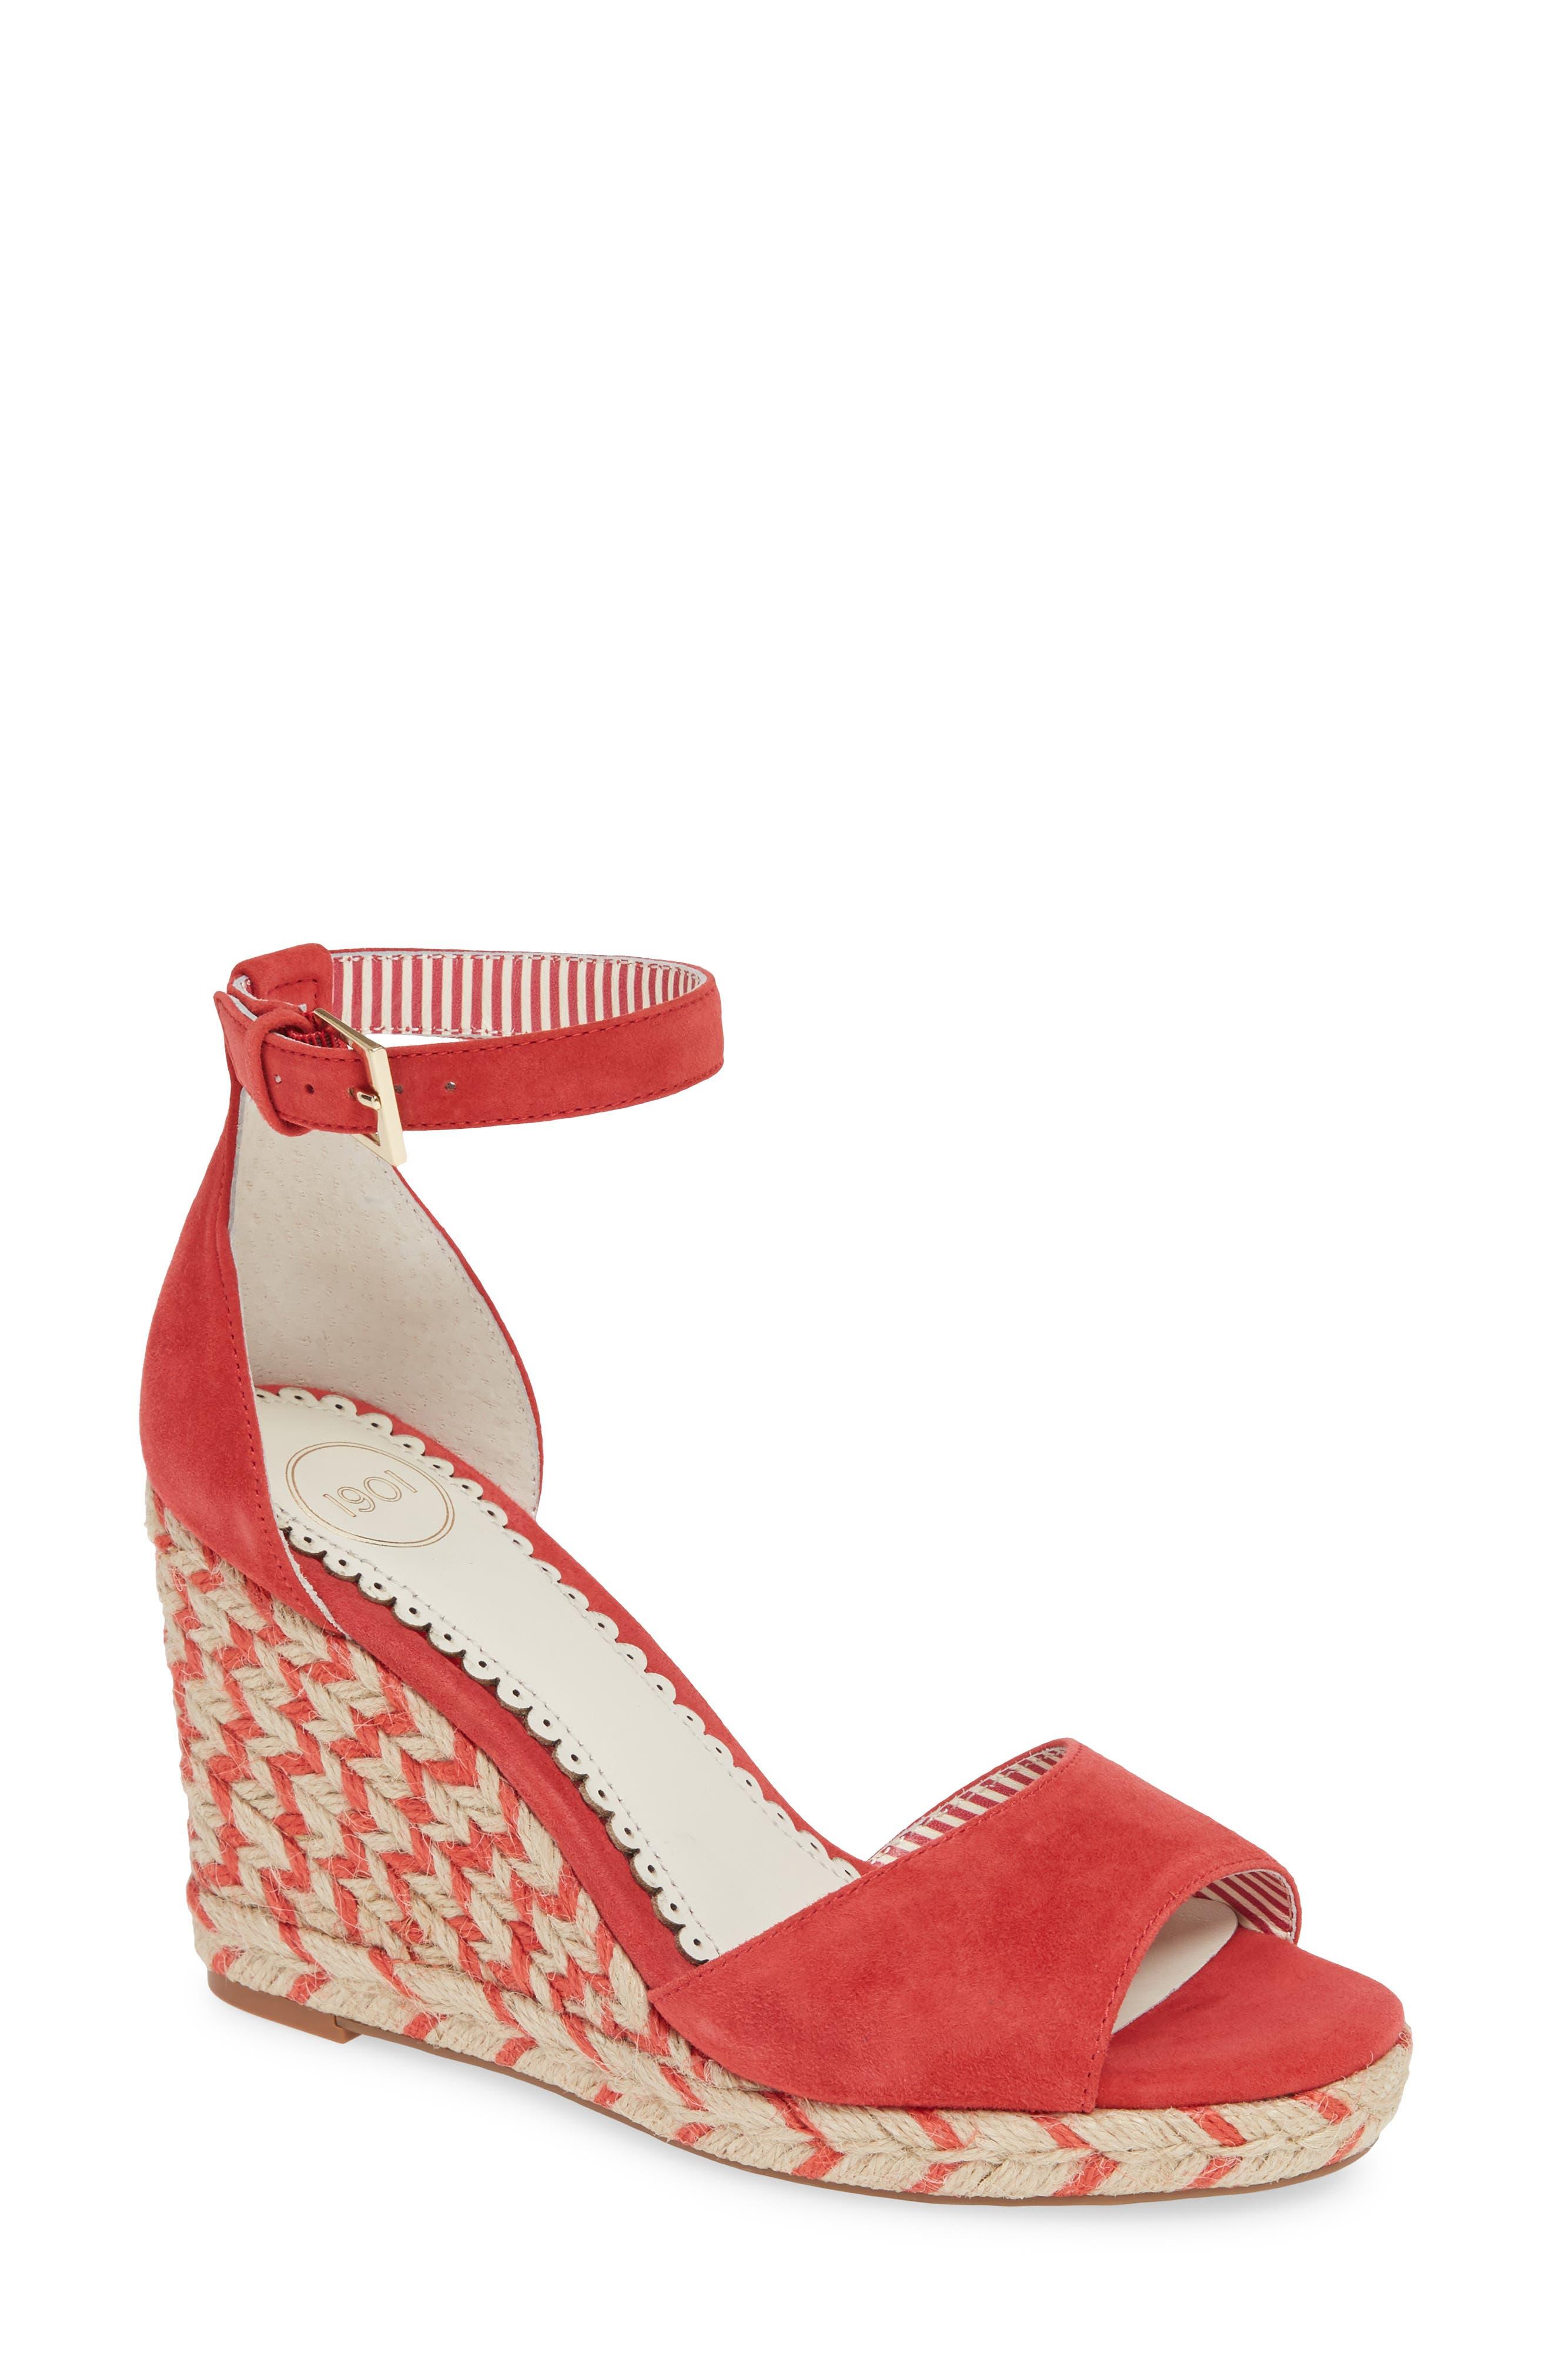 Image of 1901 Nadine Espadrille Wedge Ankle Strap Sandal